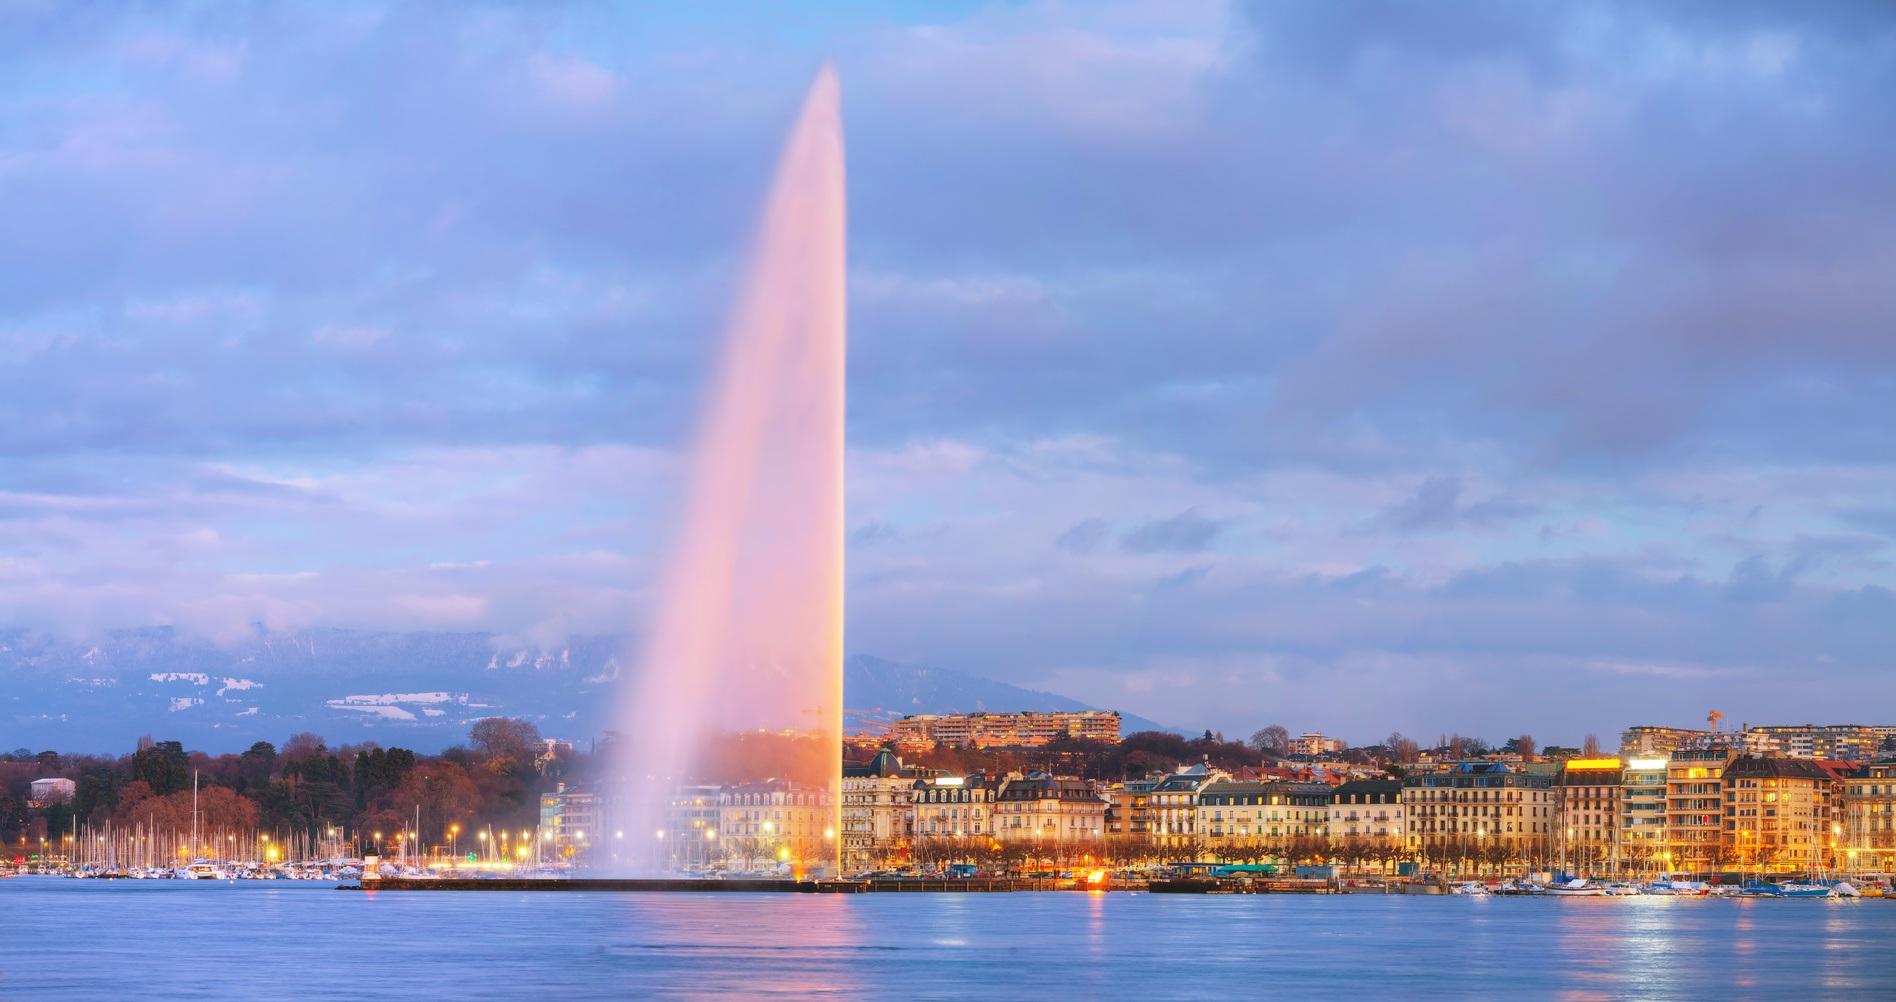 giant water fountain